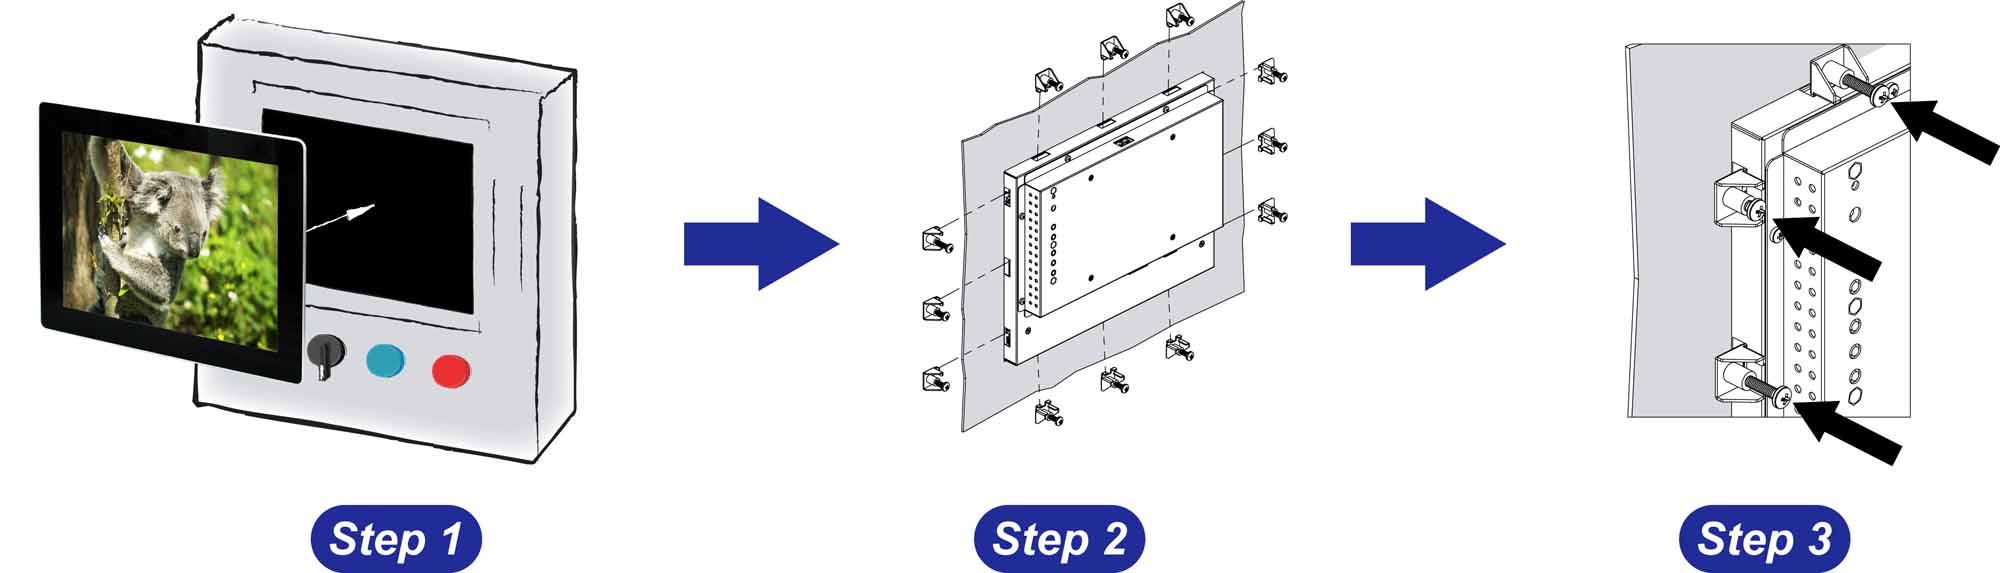 proimages/product/Full_Flat_Industrial_Open_Frame/FFOF_Description.jpg